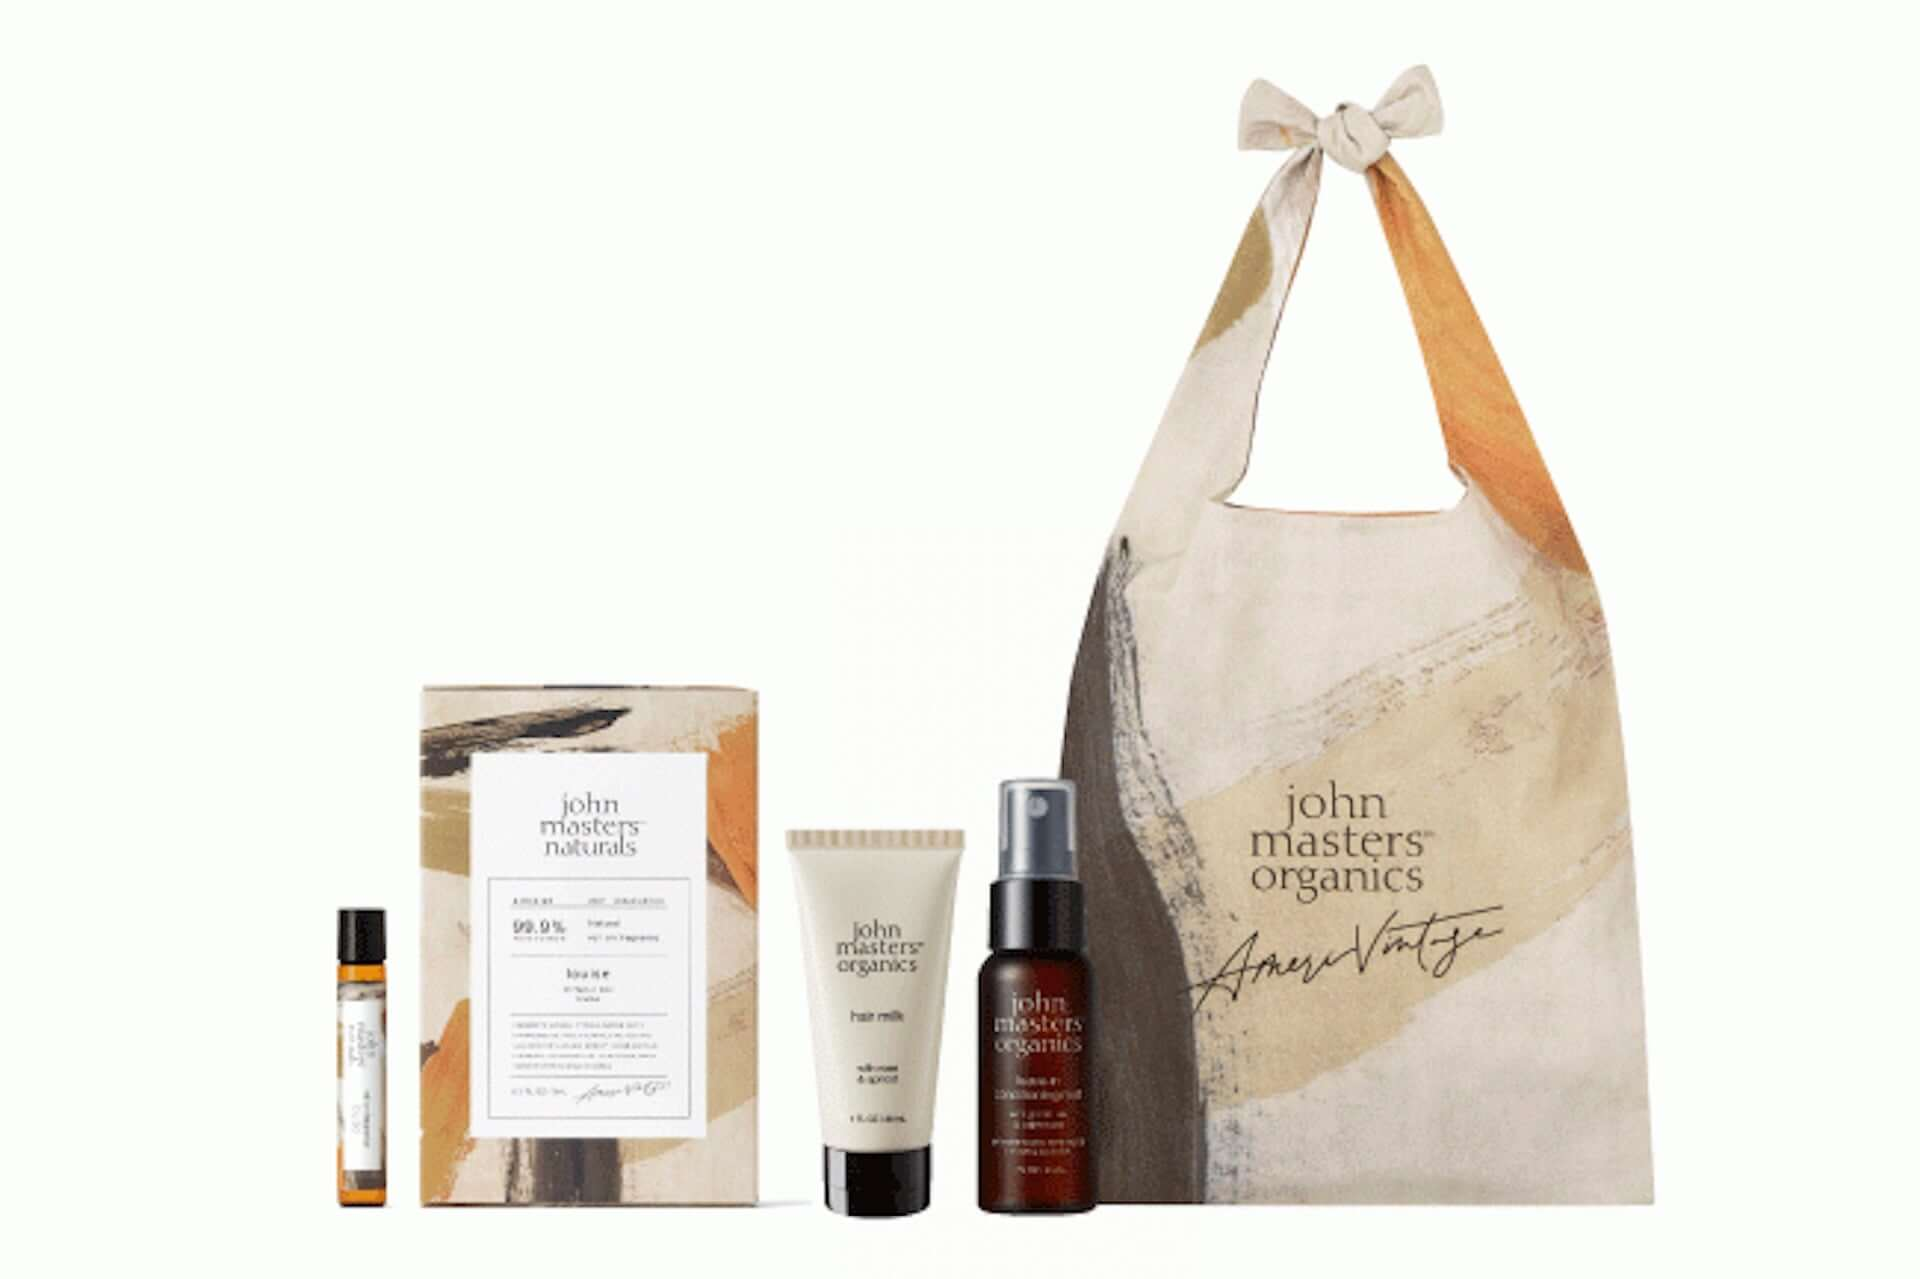 john masters organicsとAmeri VINTAGEのコラボフレグランスが数量限定で発売決定!オレンジとバニラの香りをブレンド lf210202_johnmasters-amerivintage_6-1920x1279